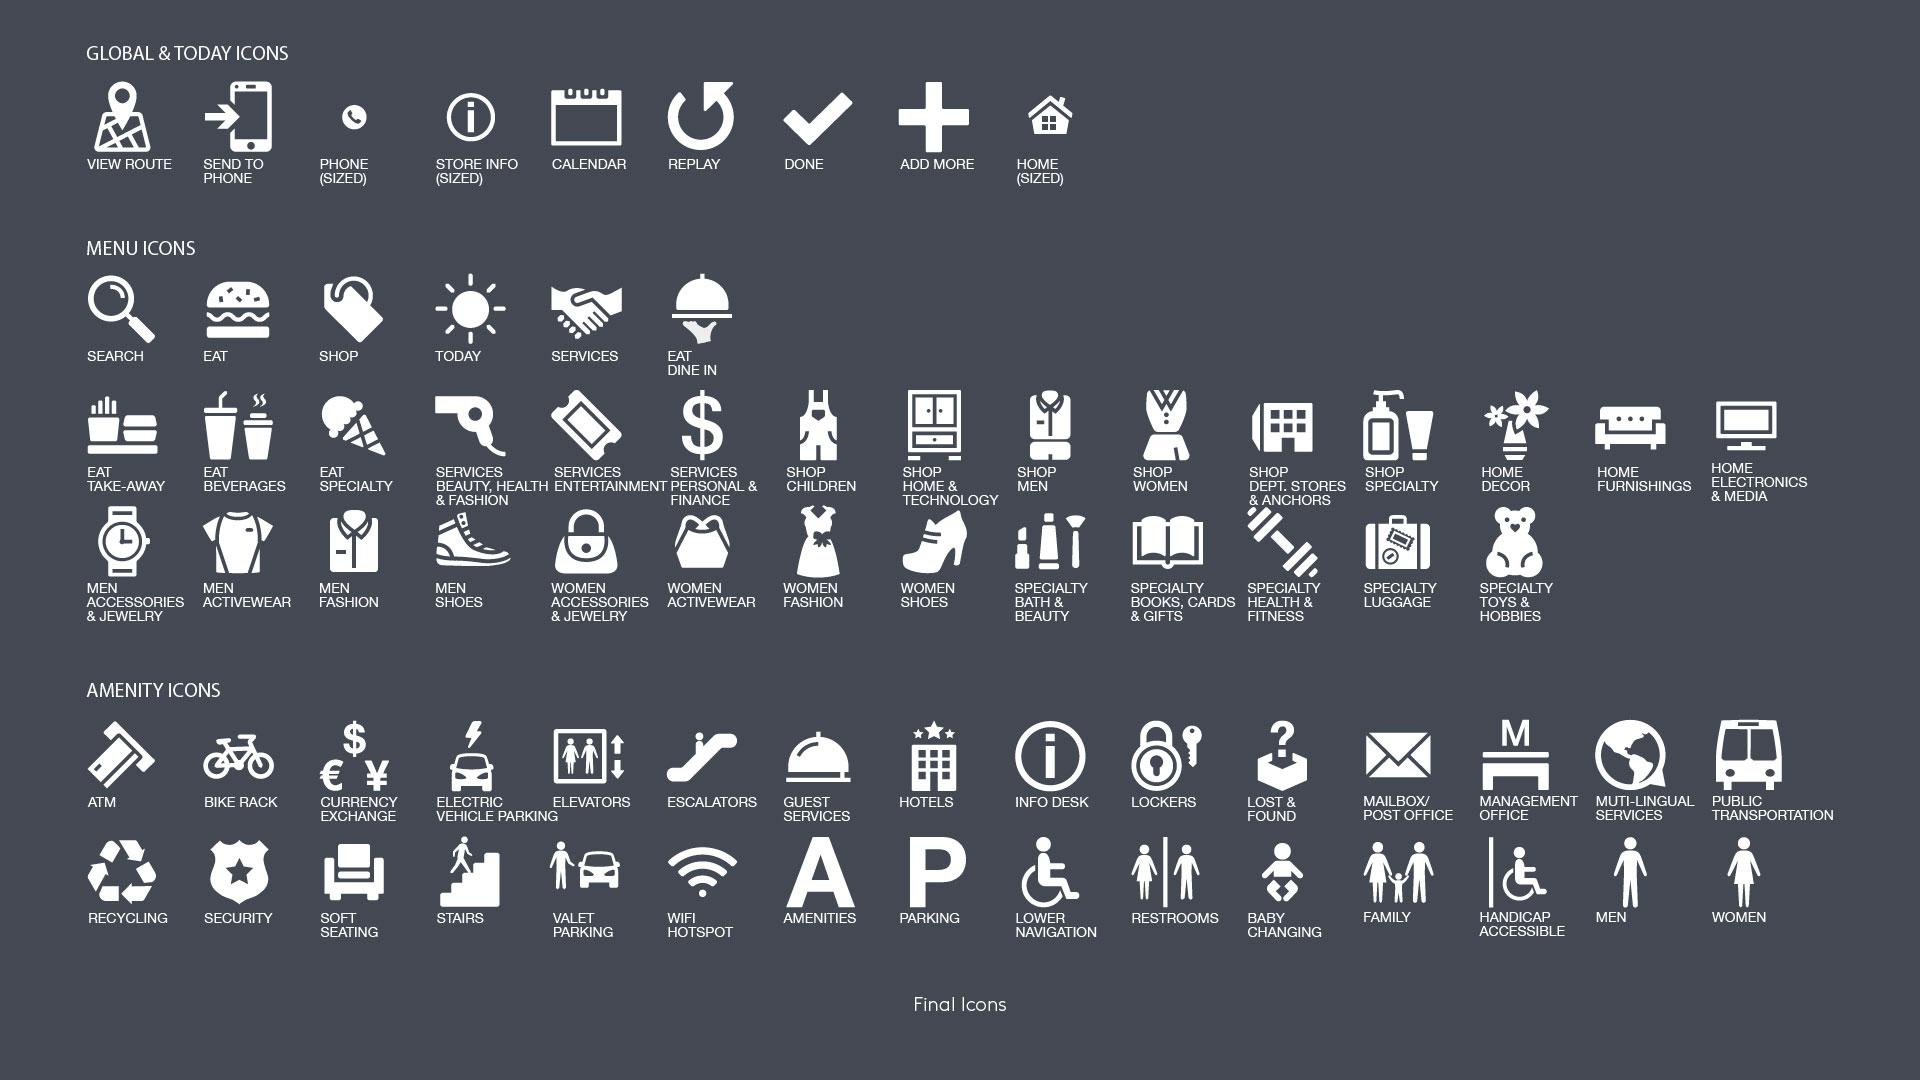 design_006_icons.jpg